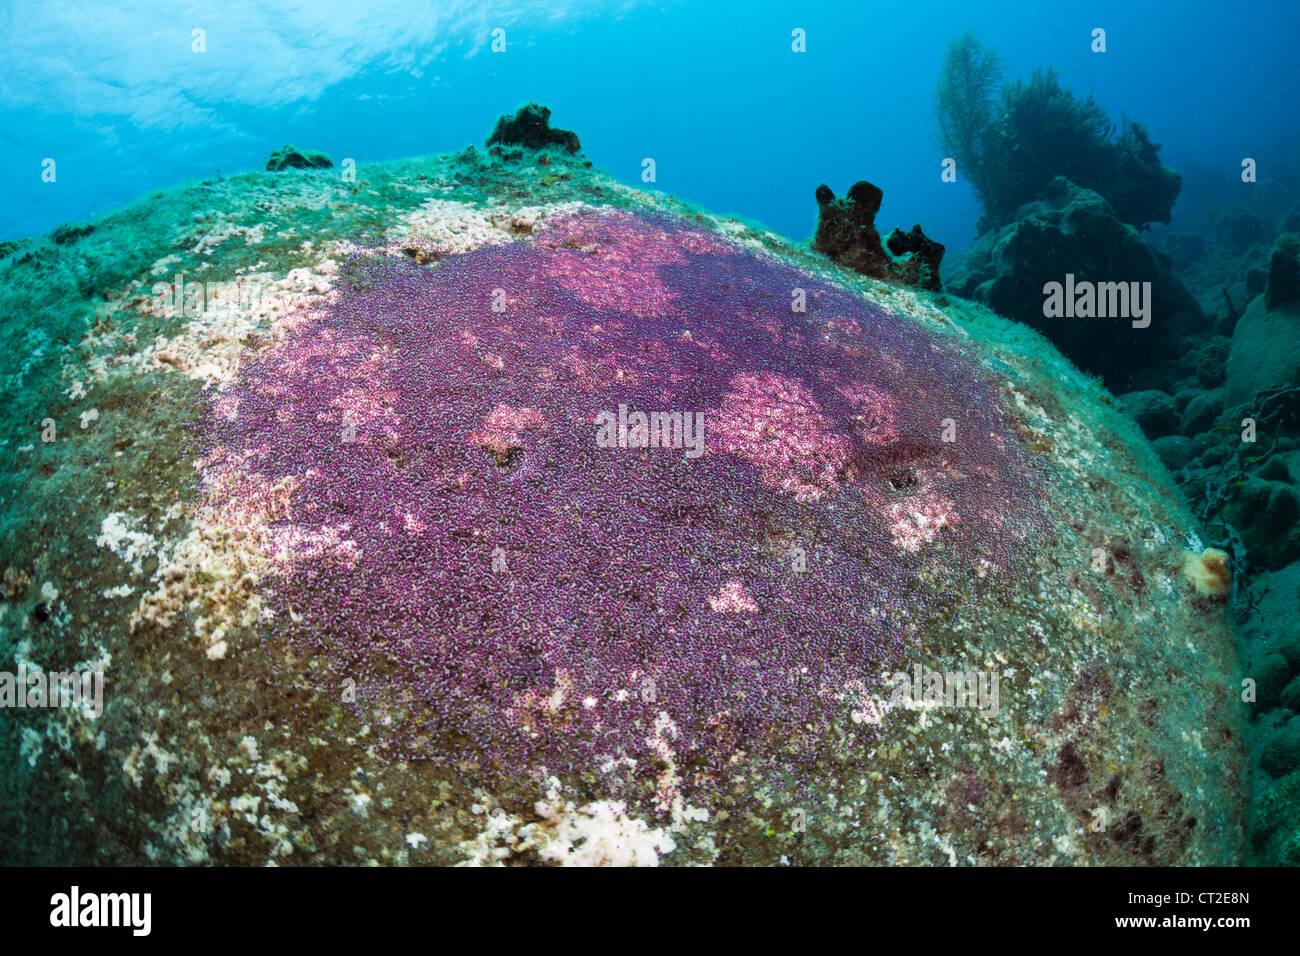 Fish Eggs on Rock, Caribbean Sea, Dominica - Stock Image